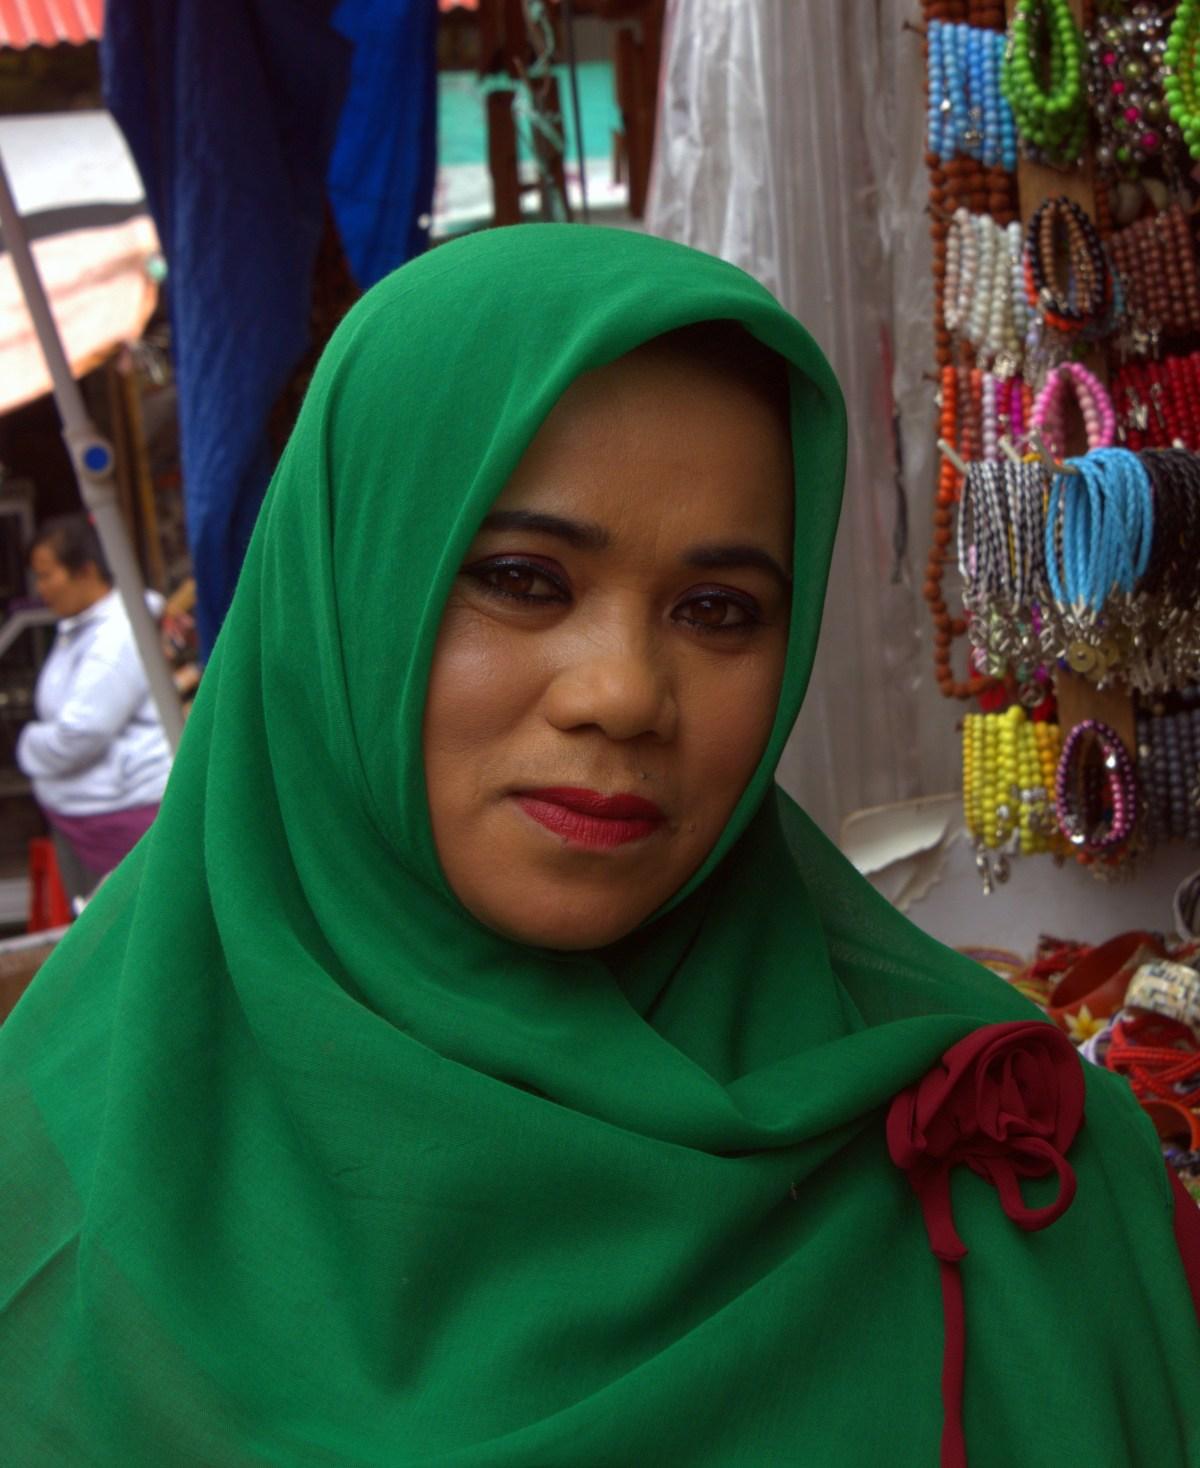 lombok is a conservative muslim island